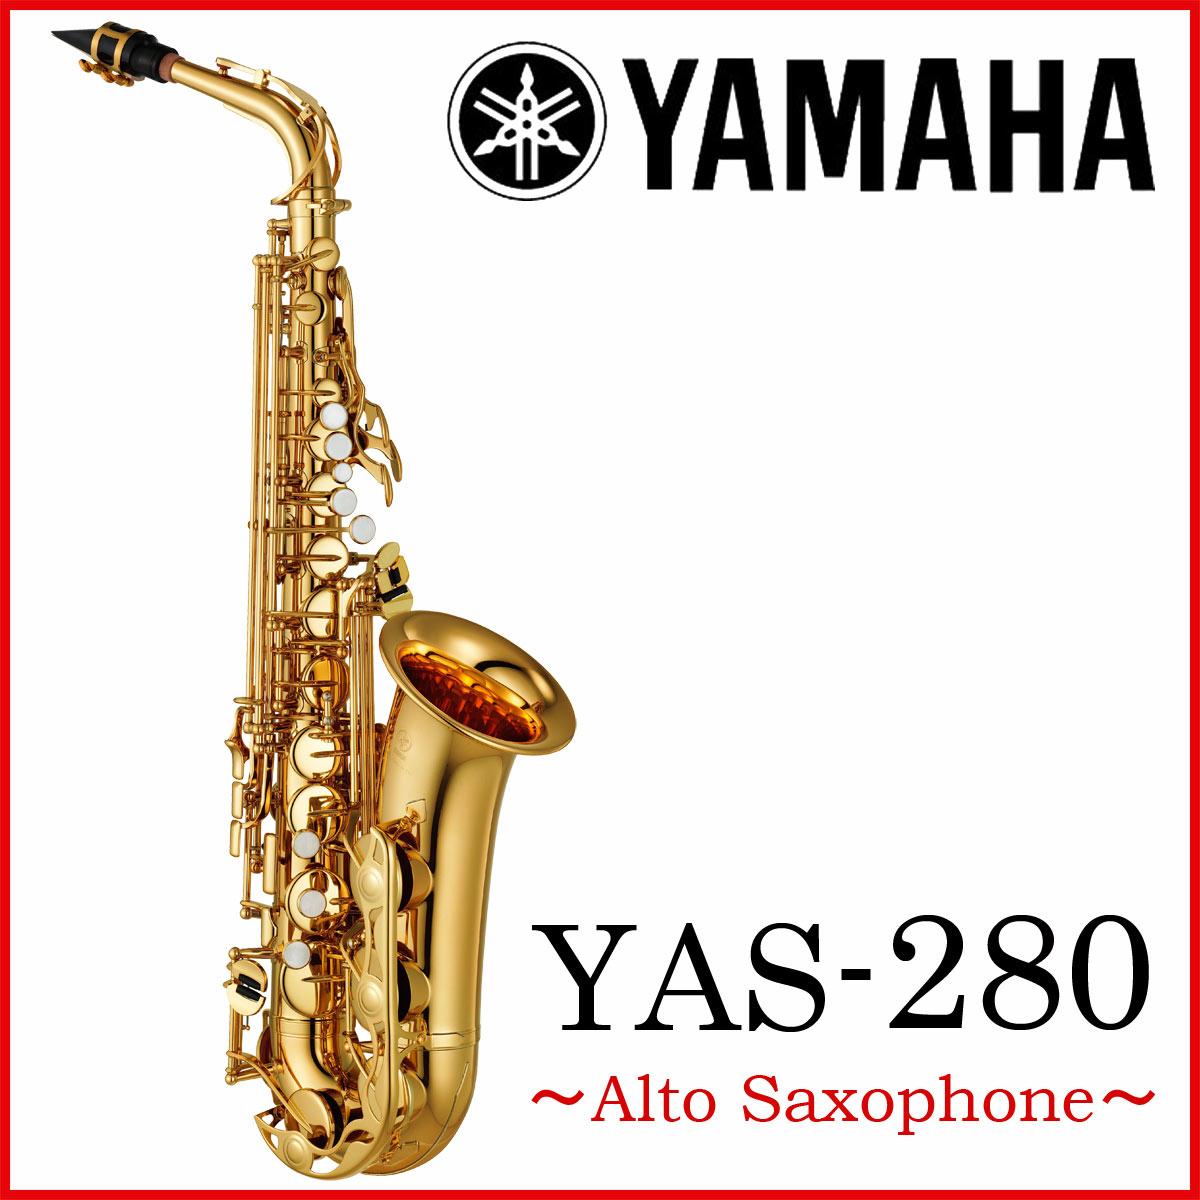 YAMAHA YAS-280 アルトサックス 入門用 限定タイムセール 《出荷前調整》《5年保証》 エントリーモデル メーカー公式ショップ 横浜店